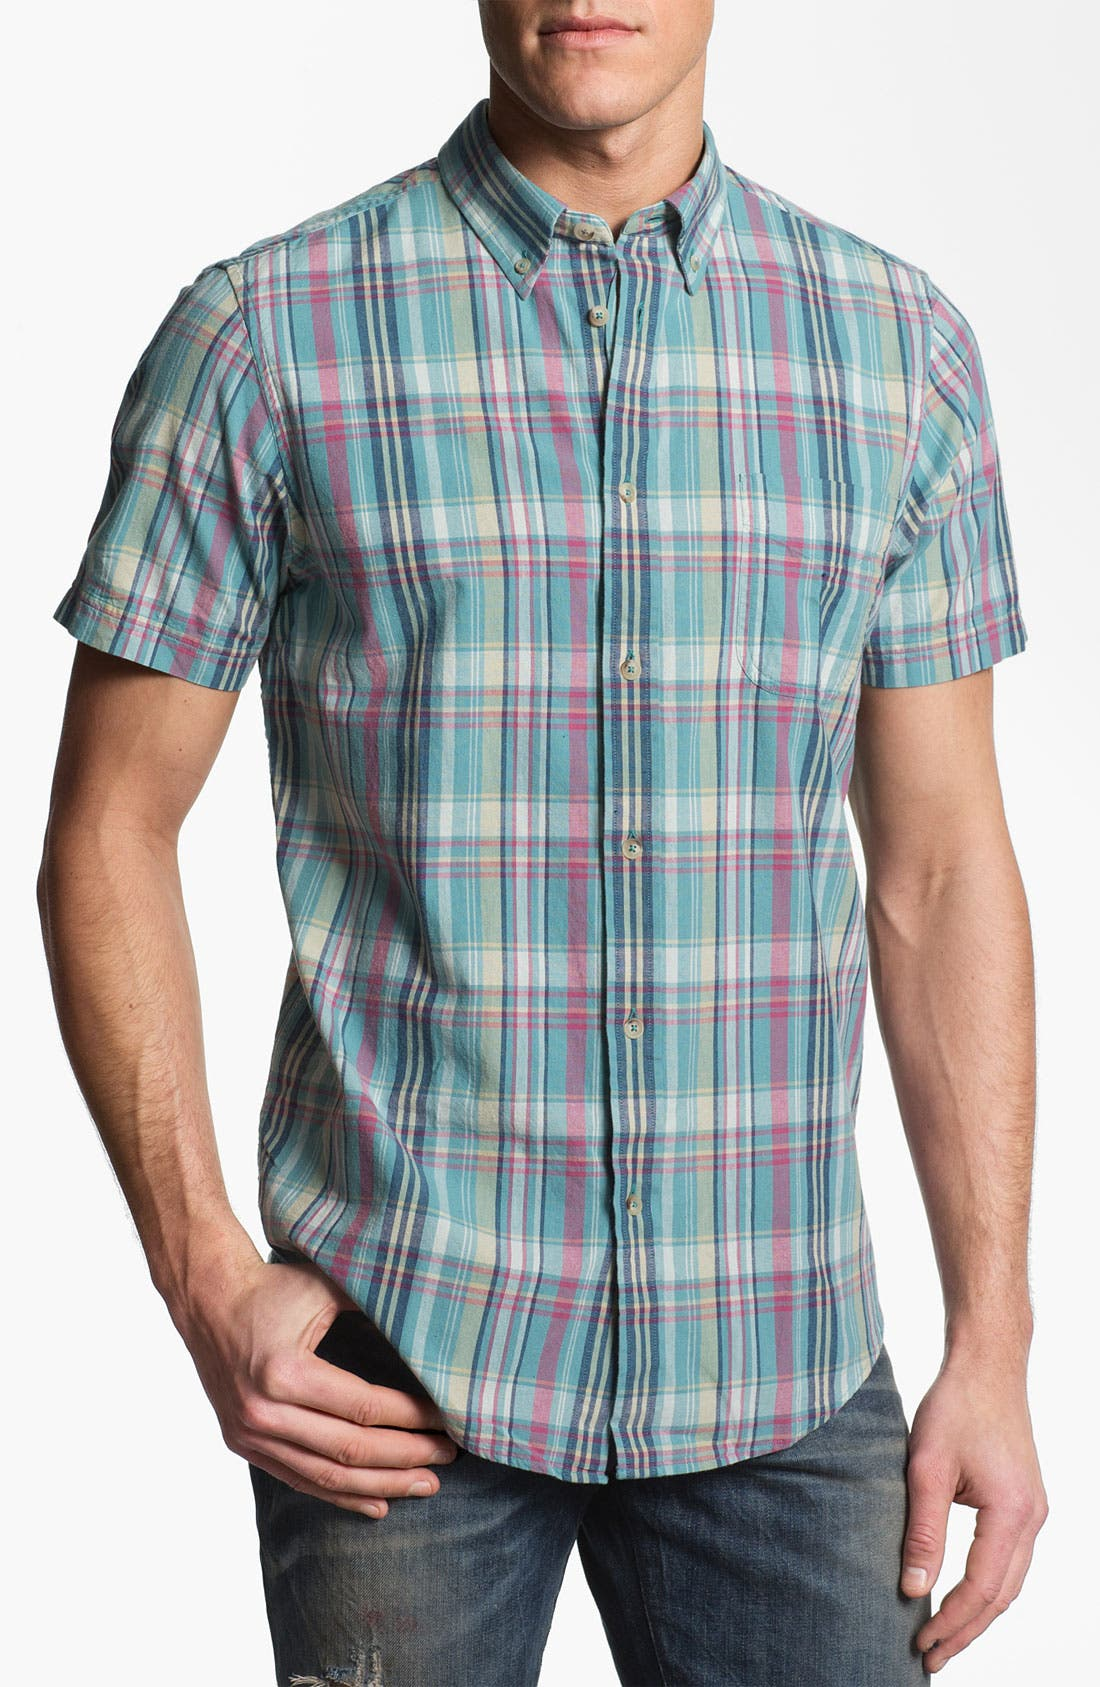 Alternate Image 1 Selected - Ben Sherman Washed Madras Check Woven Shirt